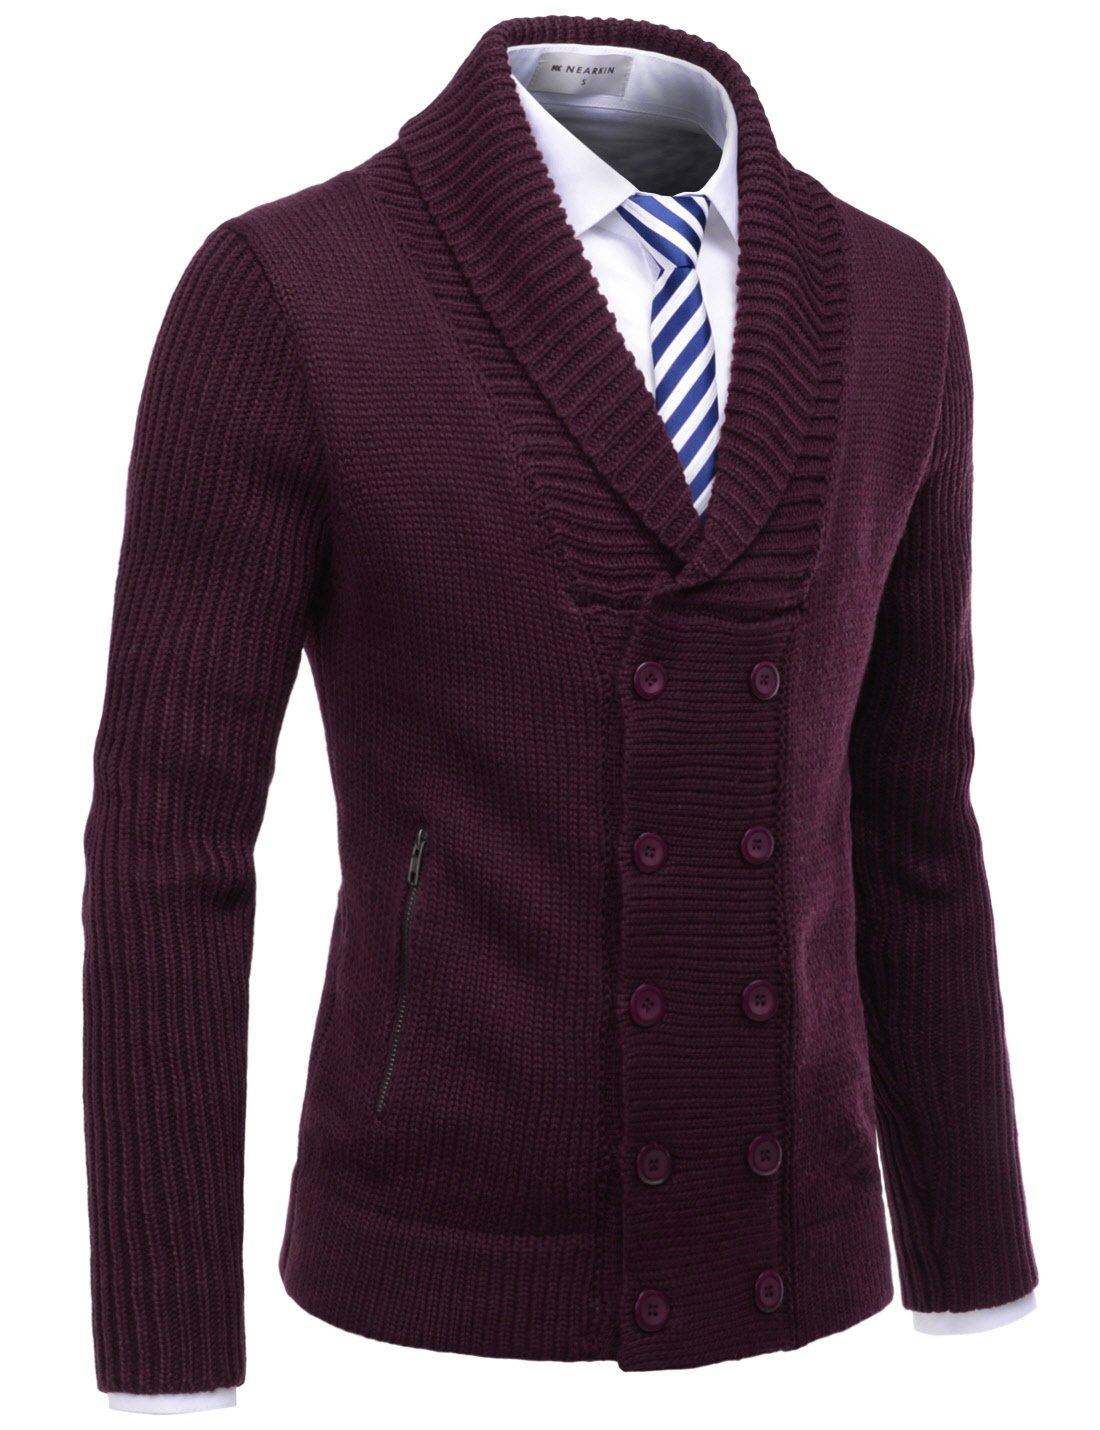 NEARKIN NKNKNDJ7 Mens Shawl Collar Double Button Down Winter Cardigan Sweaters Wine US XXL(Tag Size 2XL)